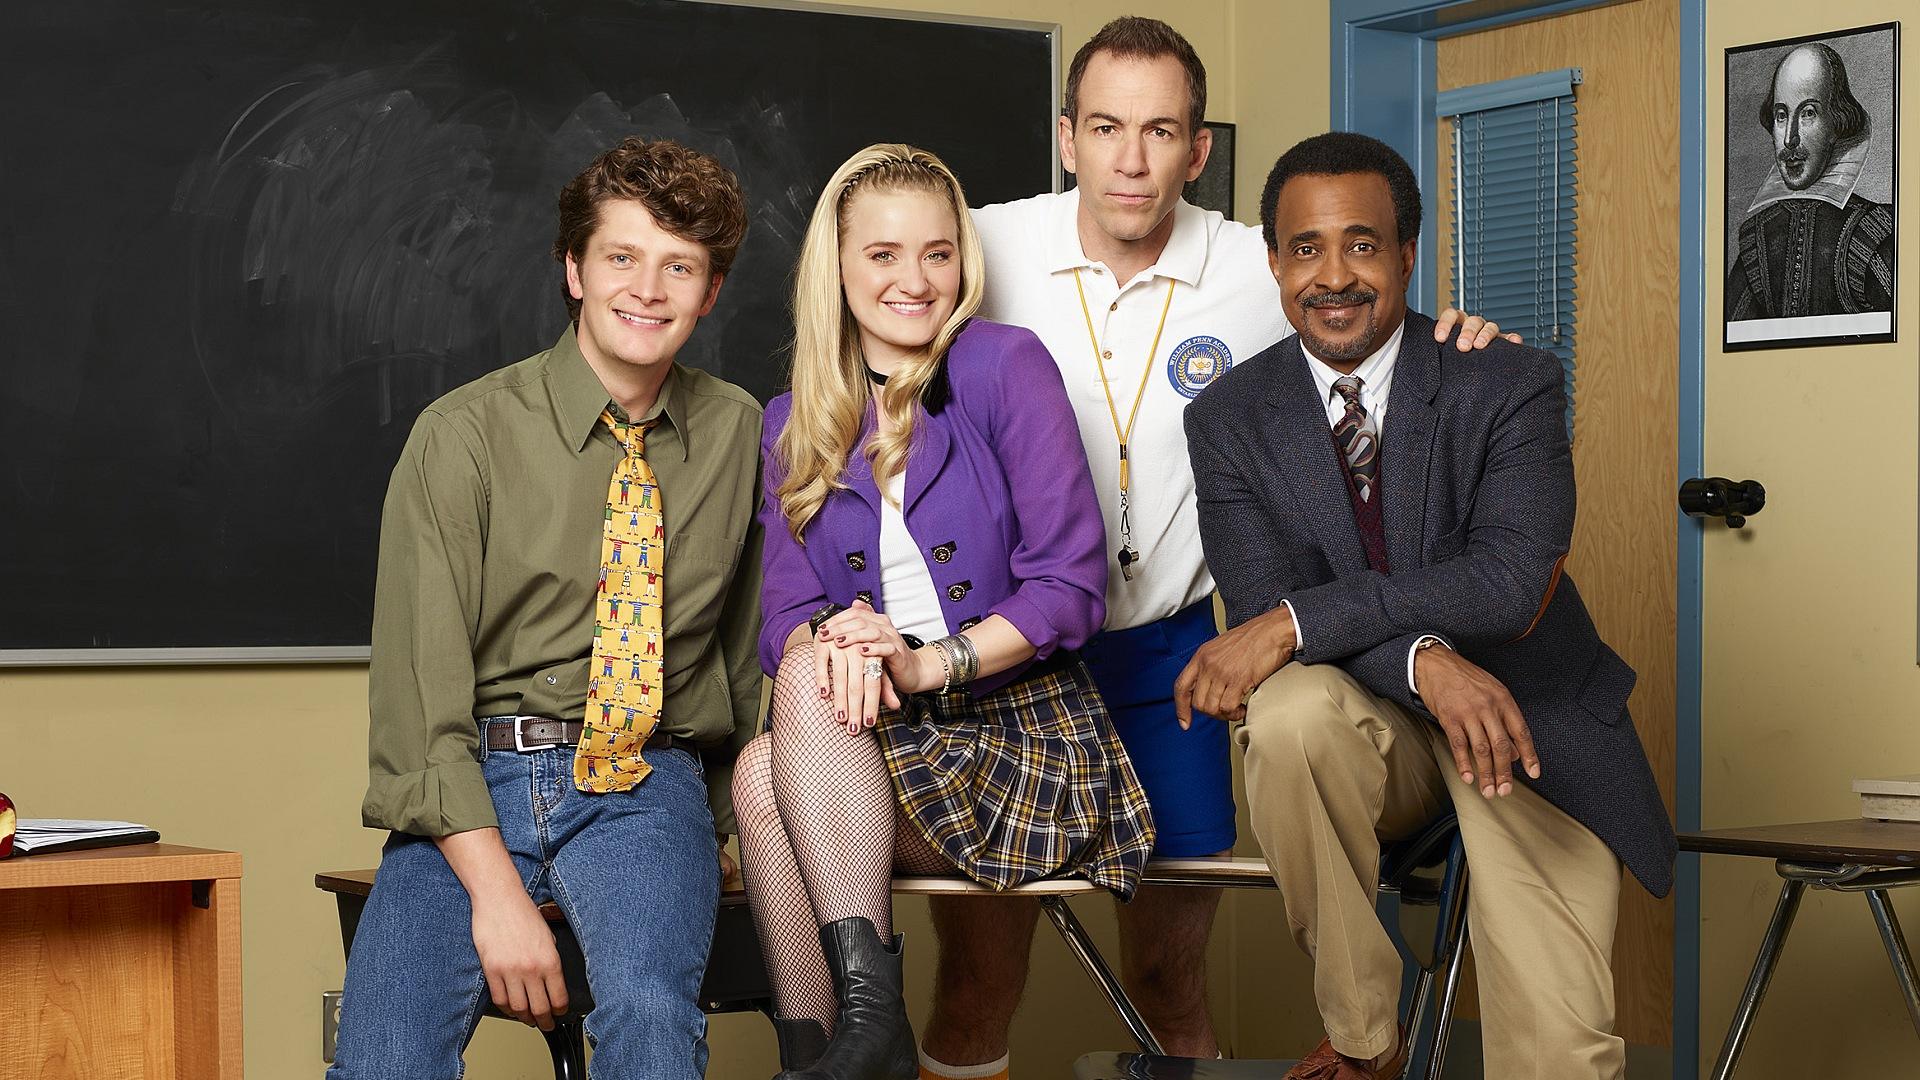 Schooled (TV Series 2019